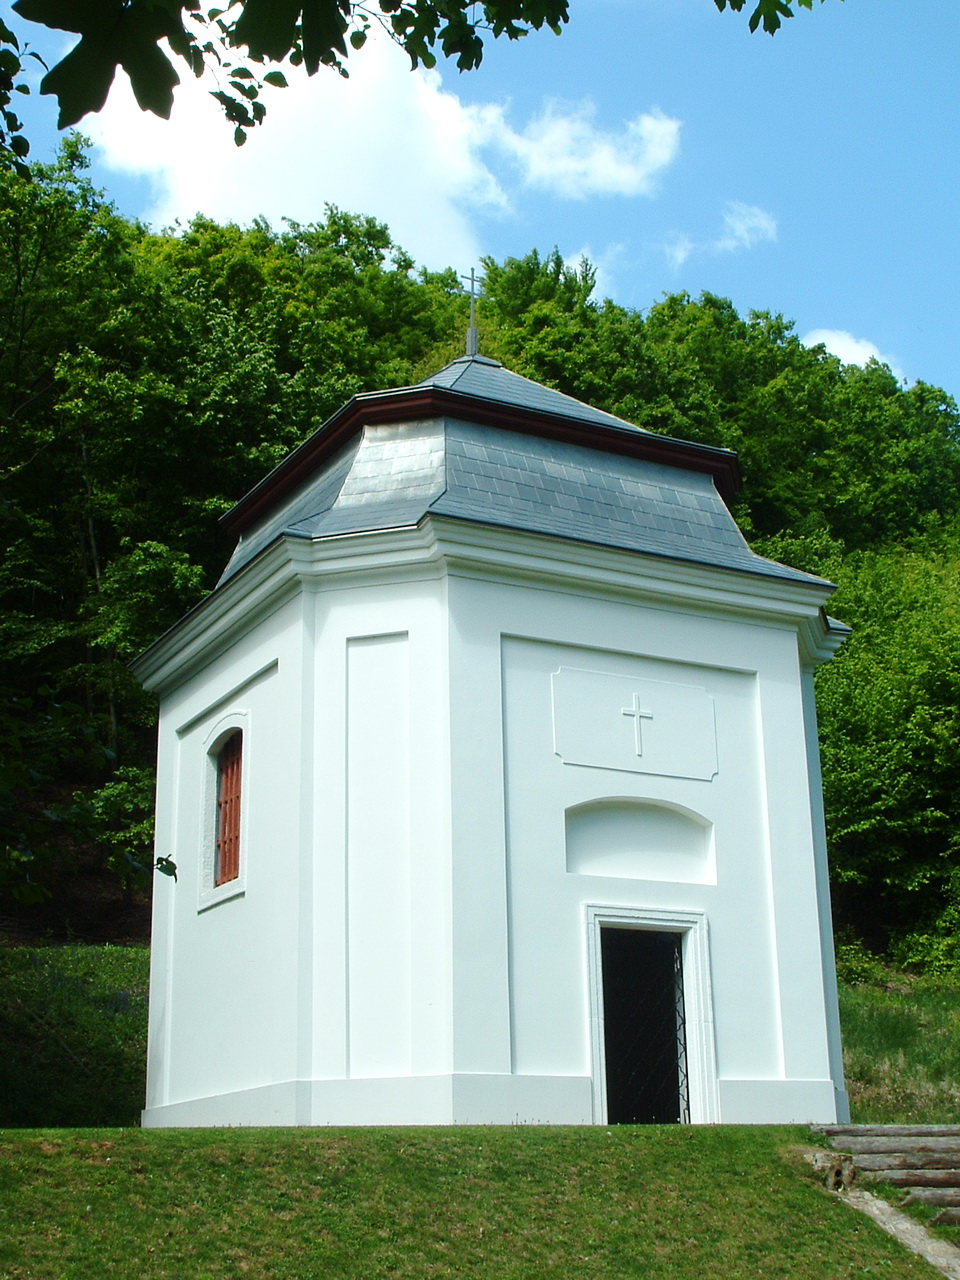 The Gilitka Chapel